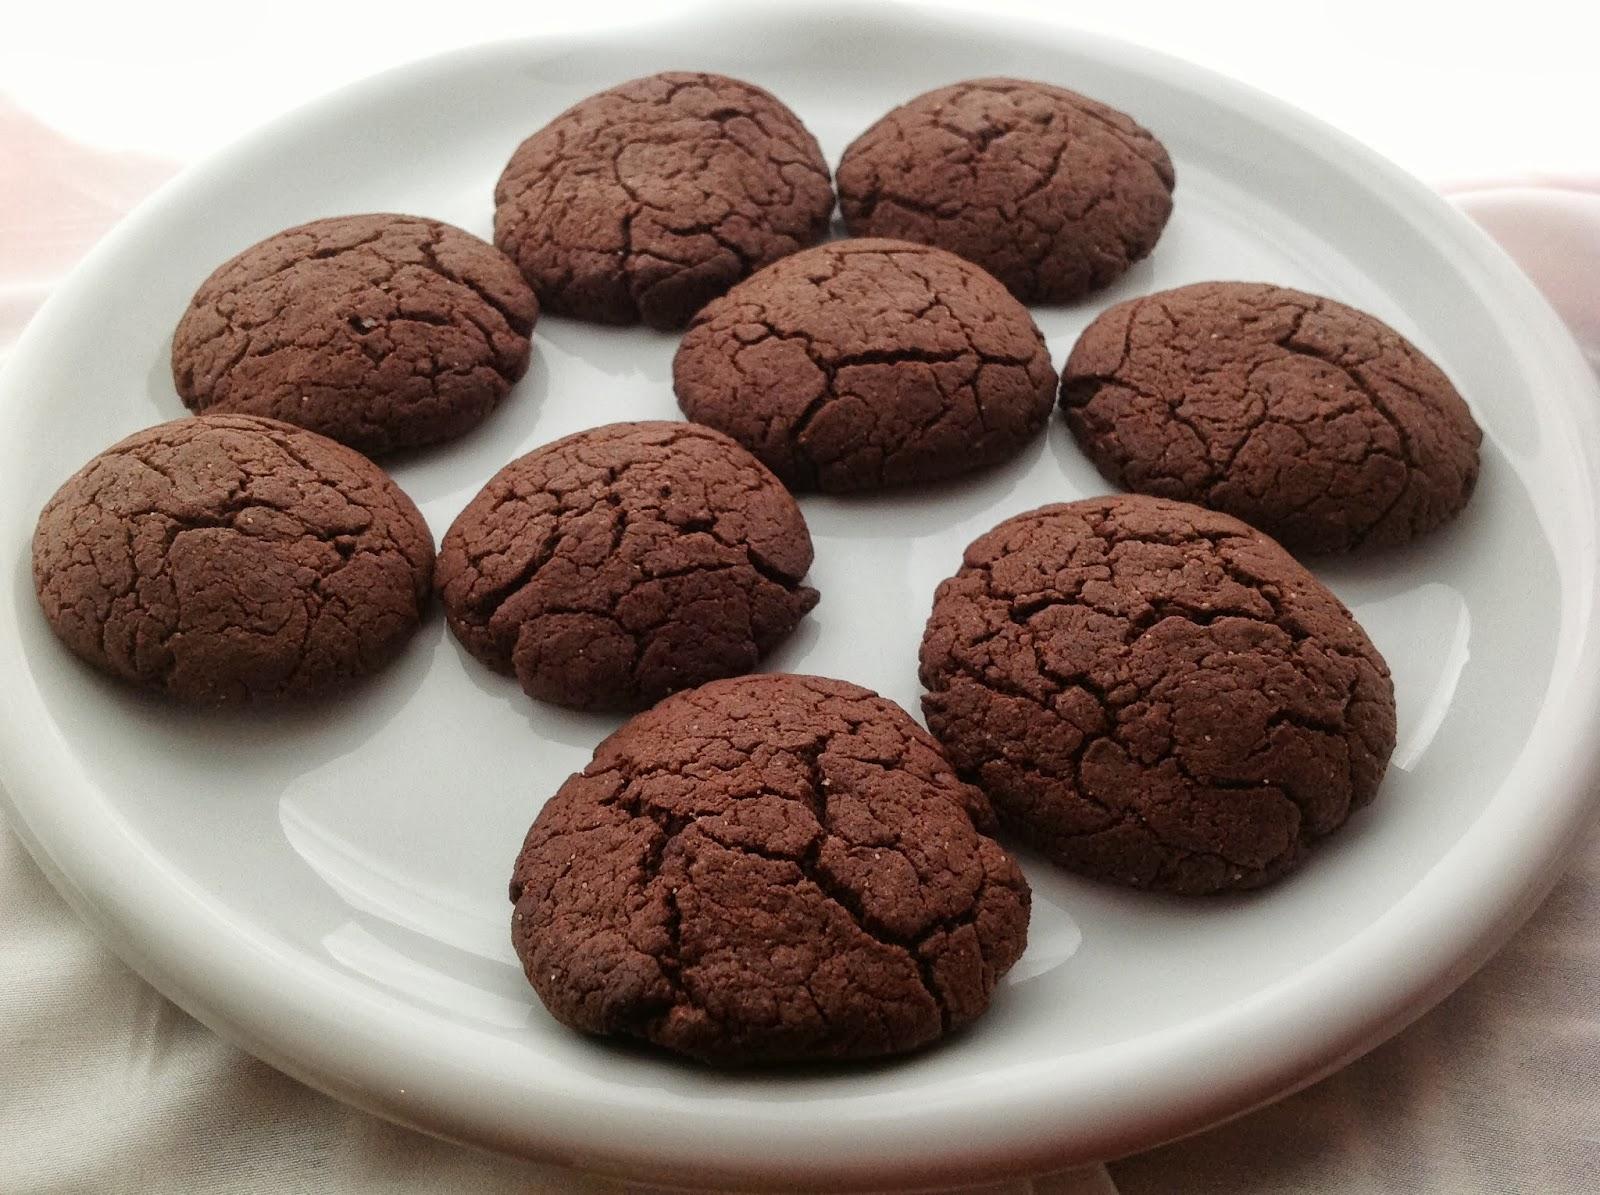 erdnussbutter schokoladen cookies pfeffer zimt minze. Black Bedroom Furniture Sets. Home Design Ideas